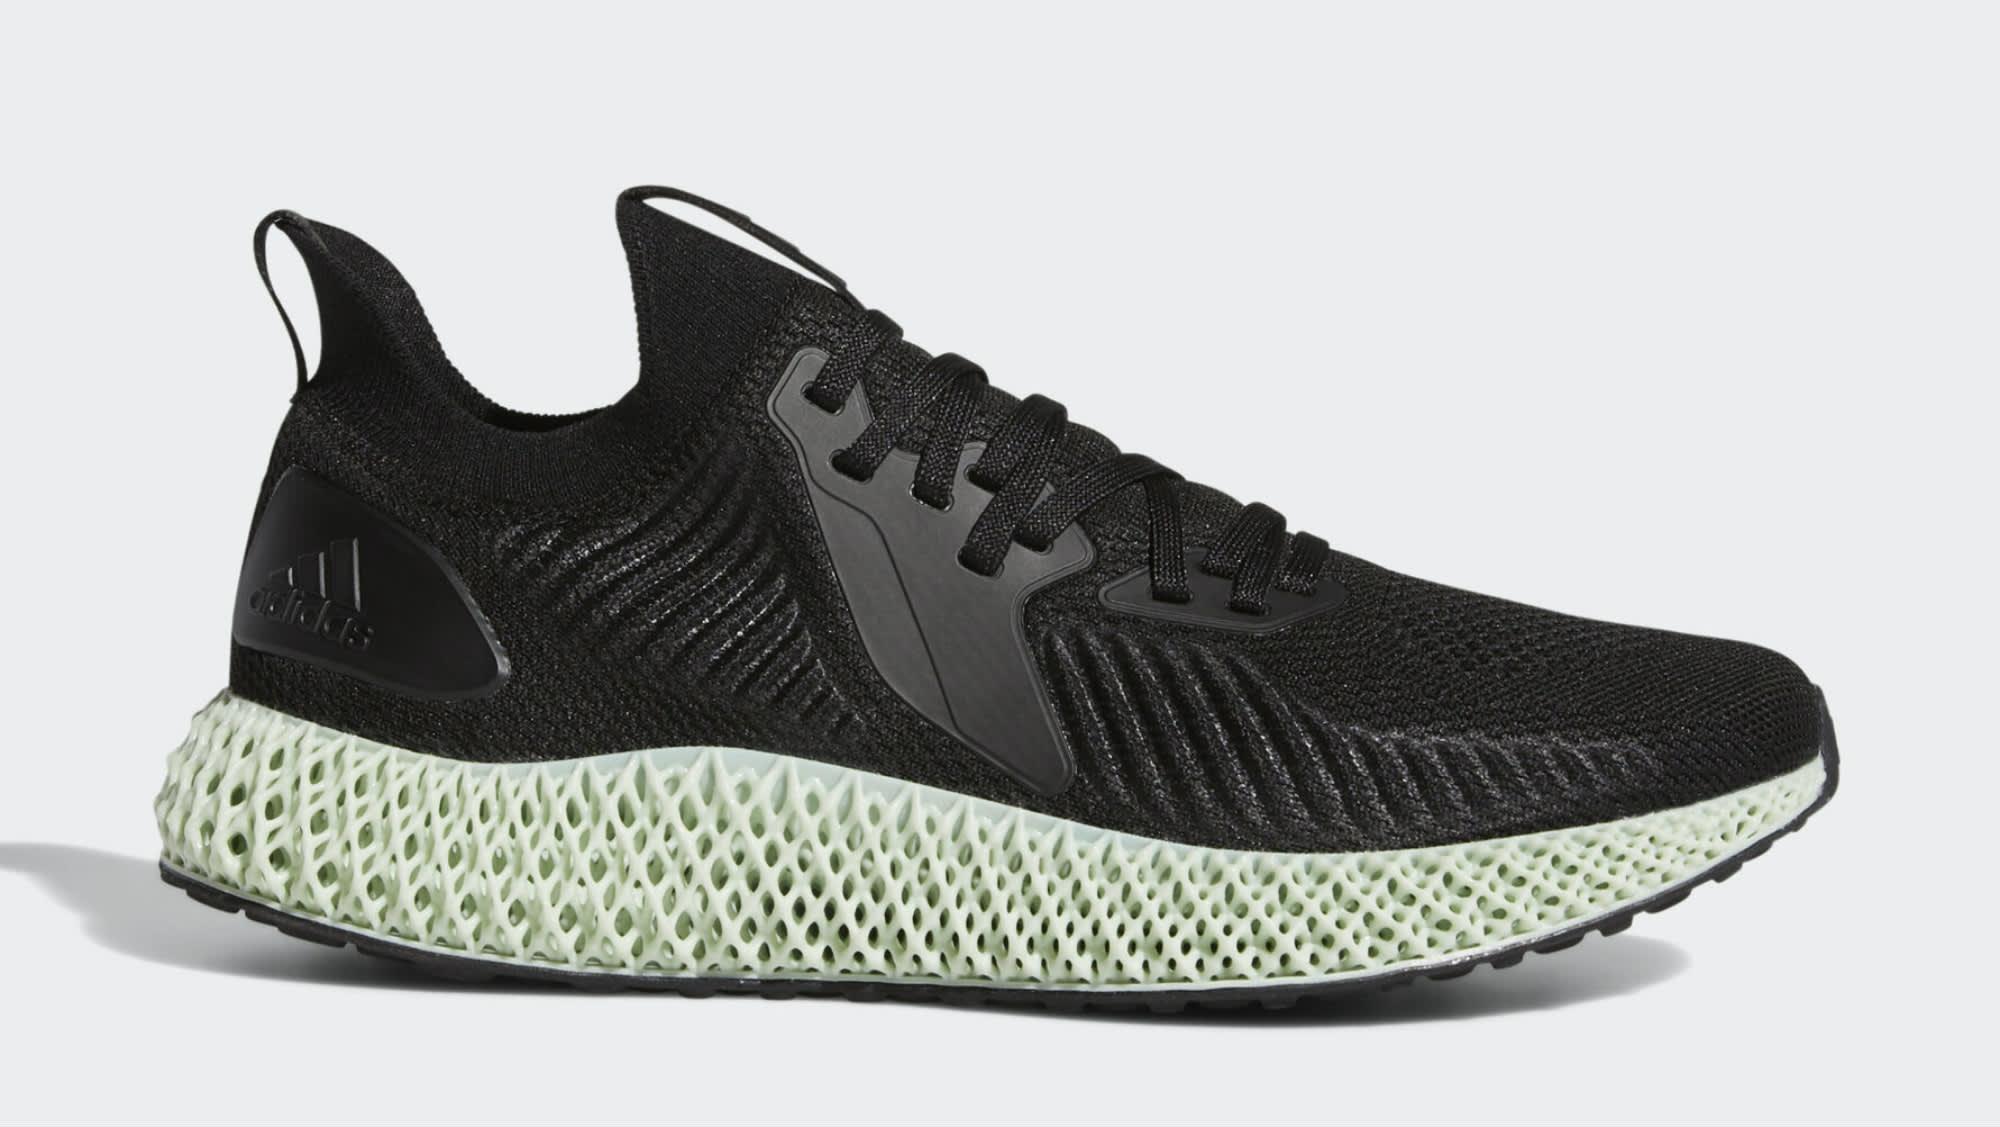 adidas-alphaedge-4d-core-black-ef3453-release-date